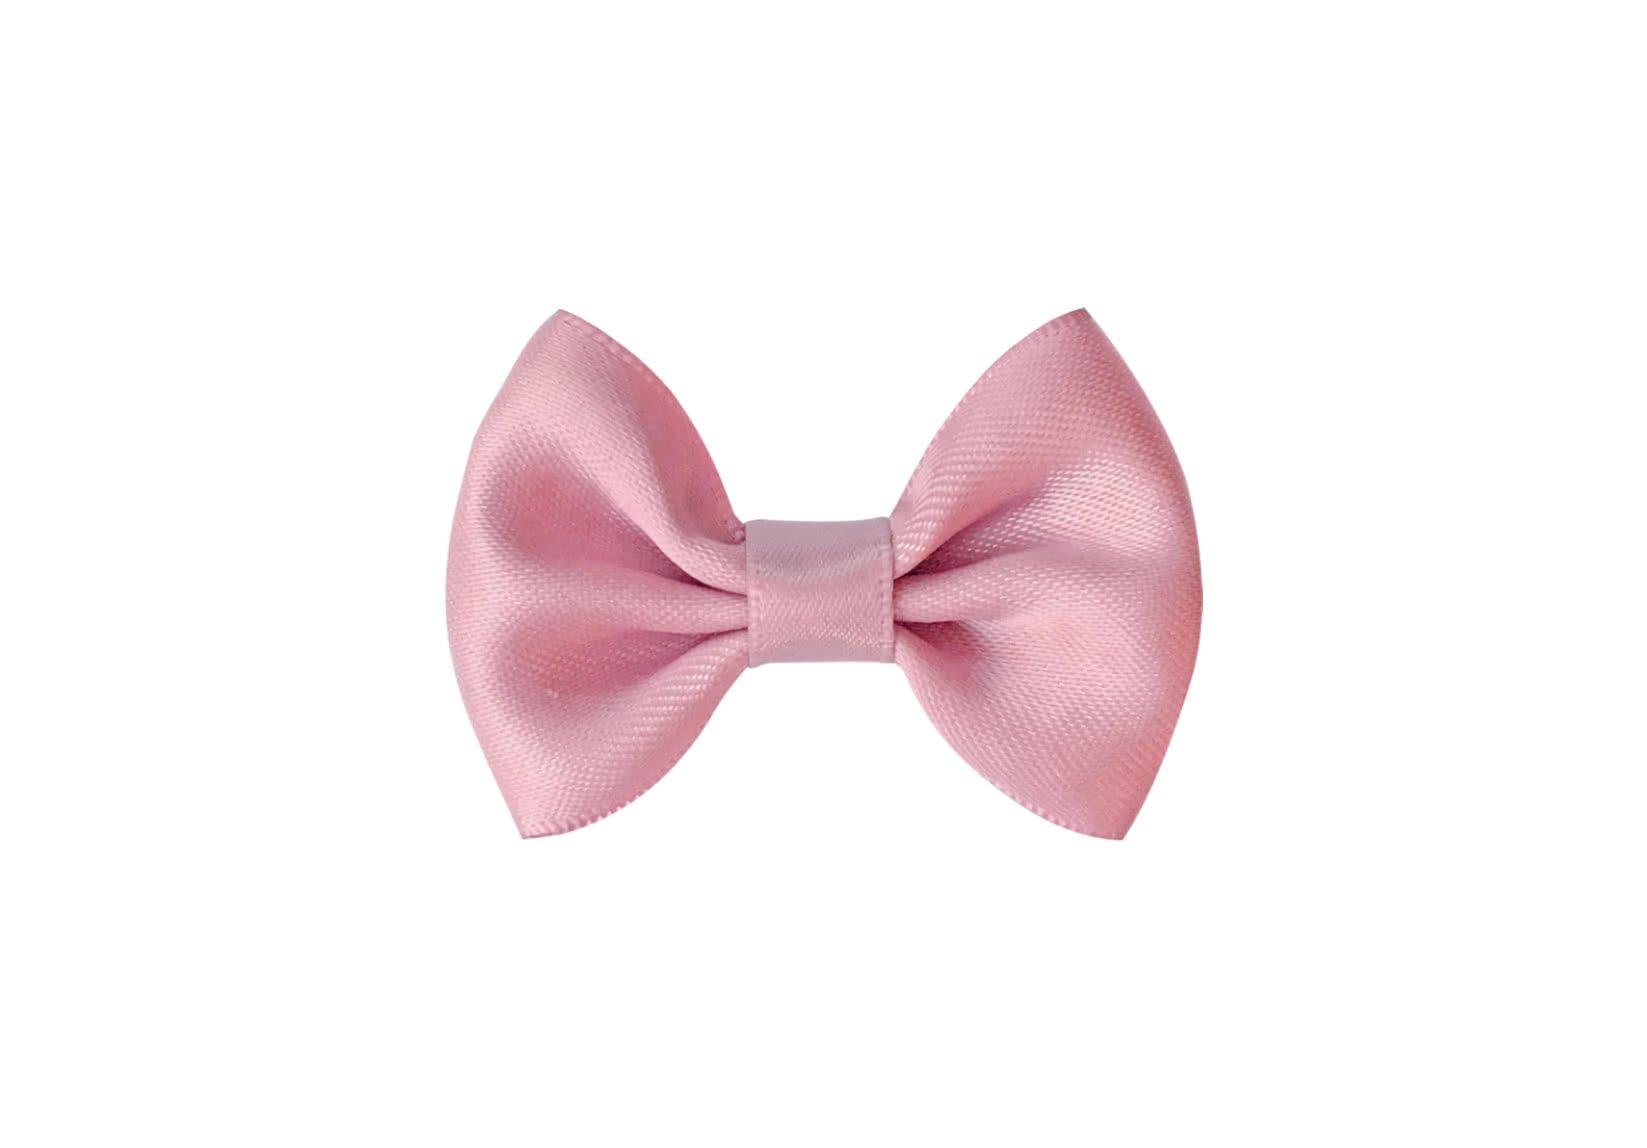 Small Bowtie Bow